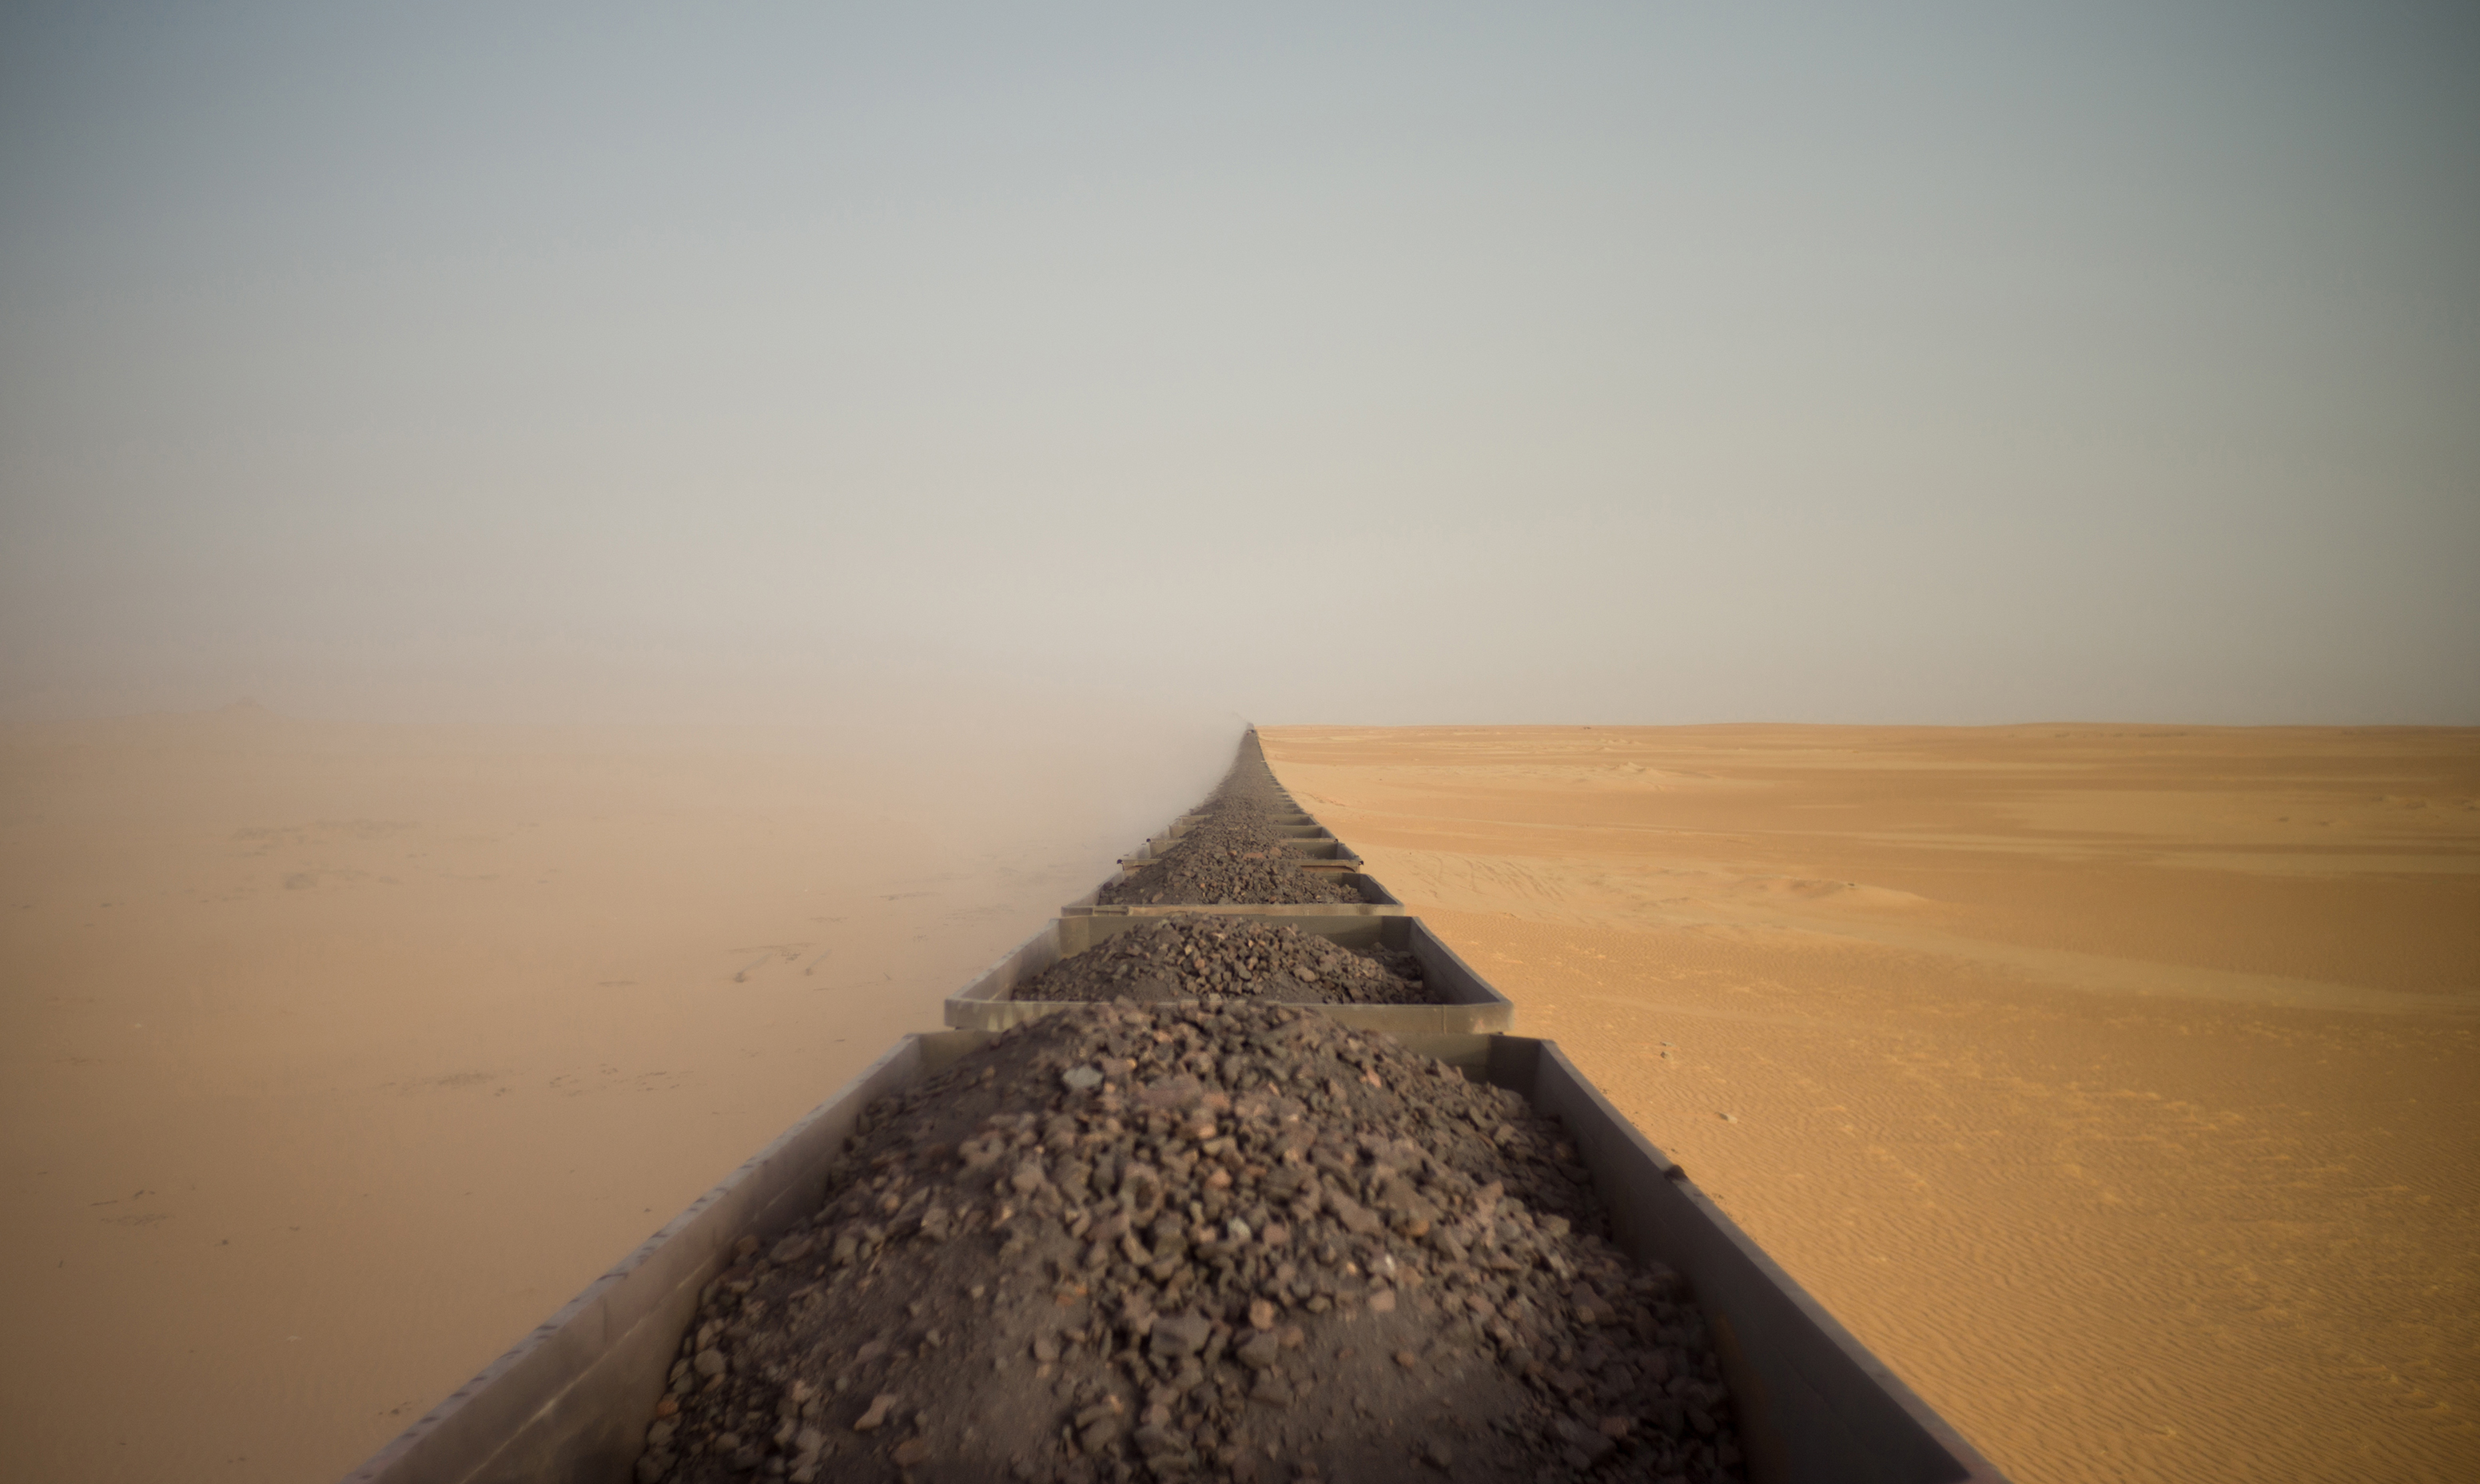 © Adrian Guerin, Australia, Winner, Open, Travel, 2020 Sony World Photography Awards